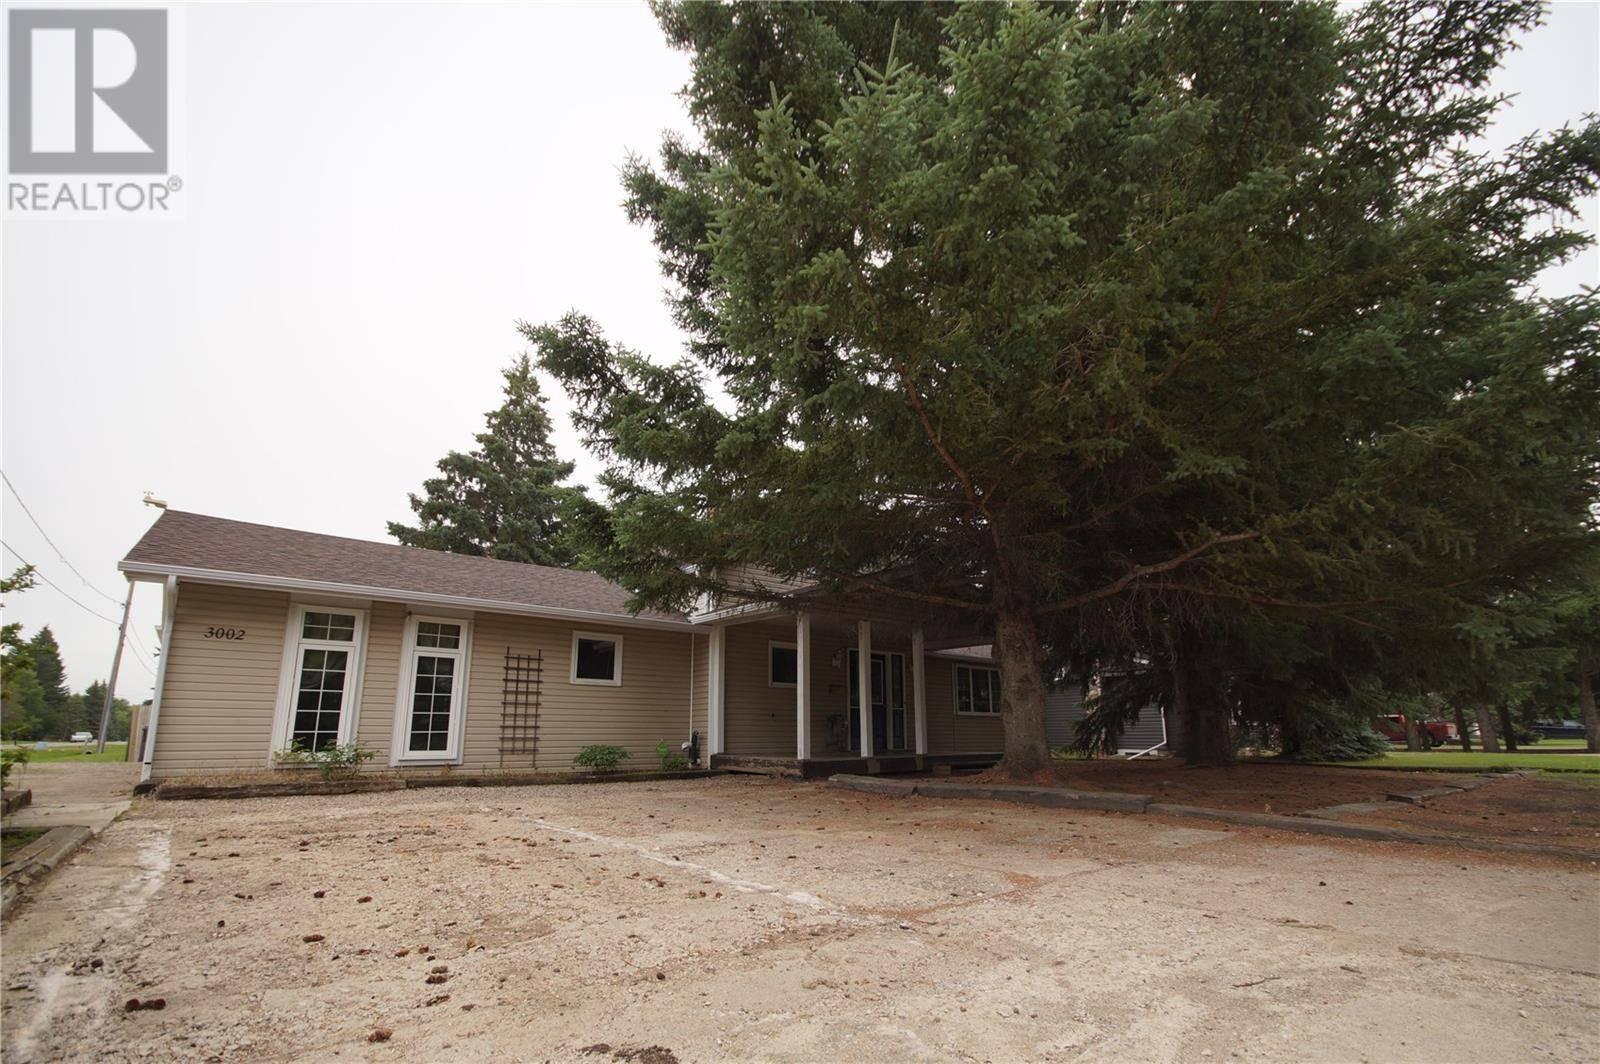 House for sale at 3002 2nd Ave E Waldheim Saskatchewan - MLS: SK778985